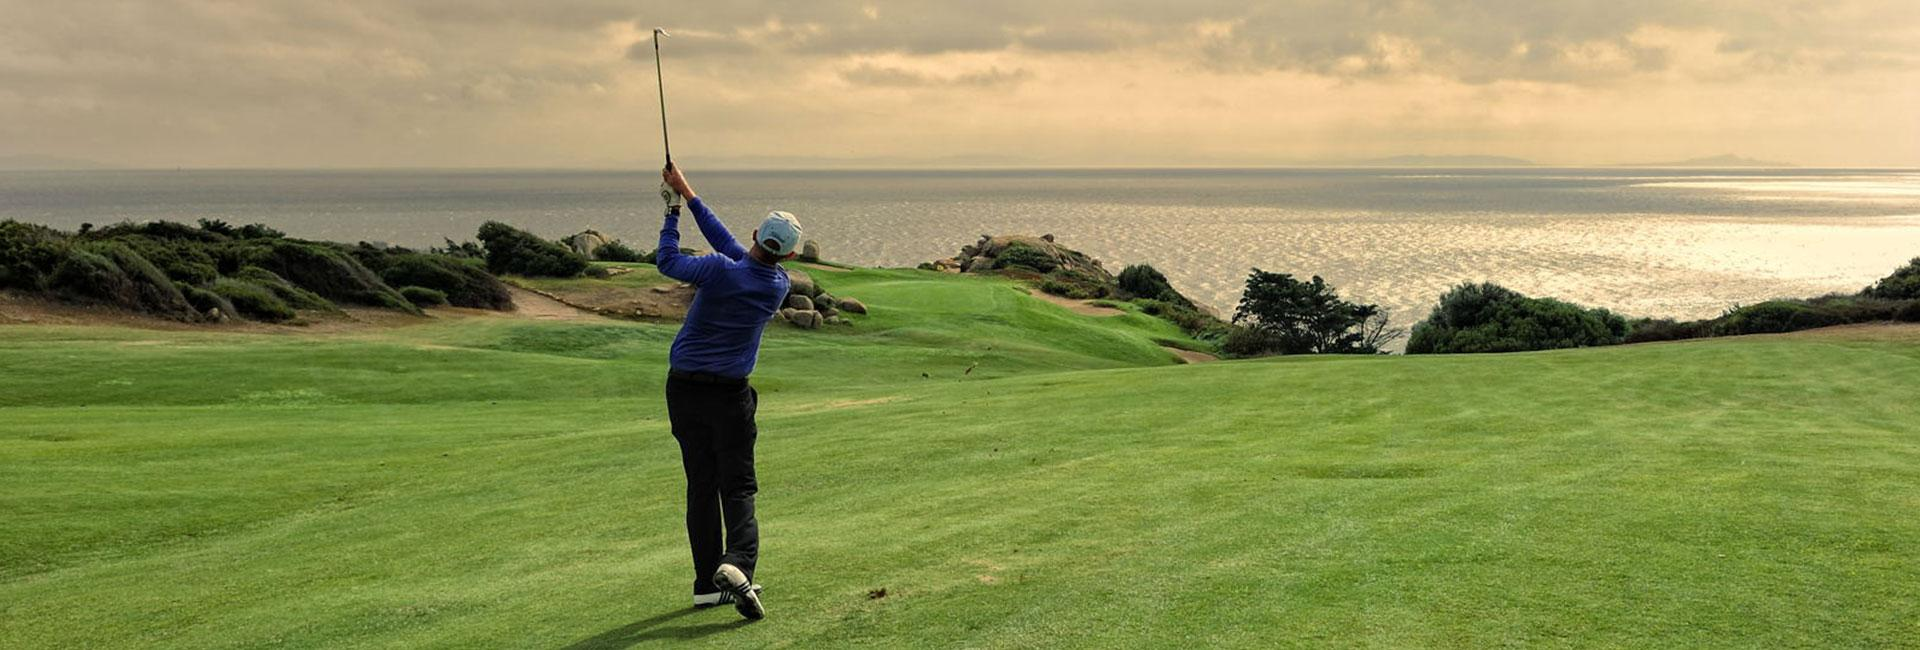 activités golf en corse Hôtel Le Pinarello en Corse